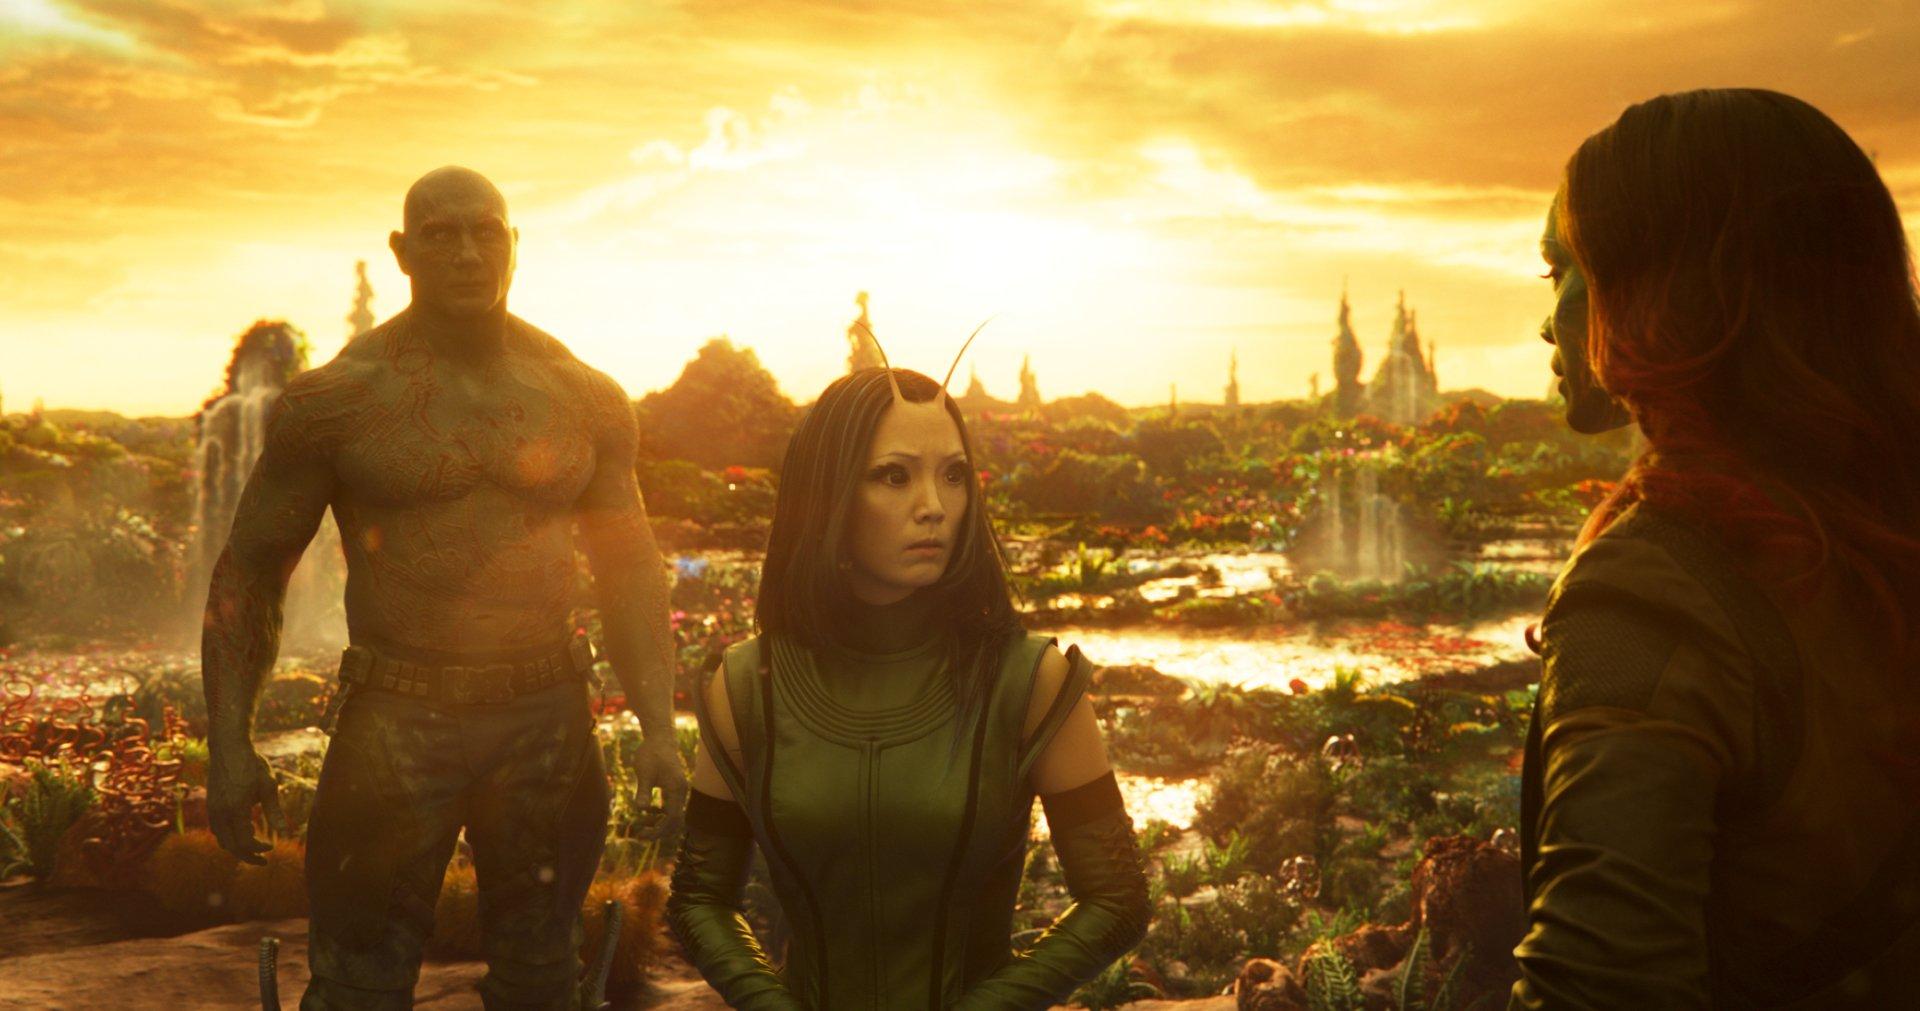 Movie - Guardians of the Galaxy Vol. 2  Zoe Saldana Drax The Destroyer Gamora Dave Bautista Mantis (Marvel Comics) Pom Klementieff Wallpaper